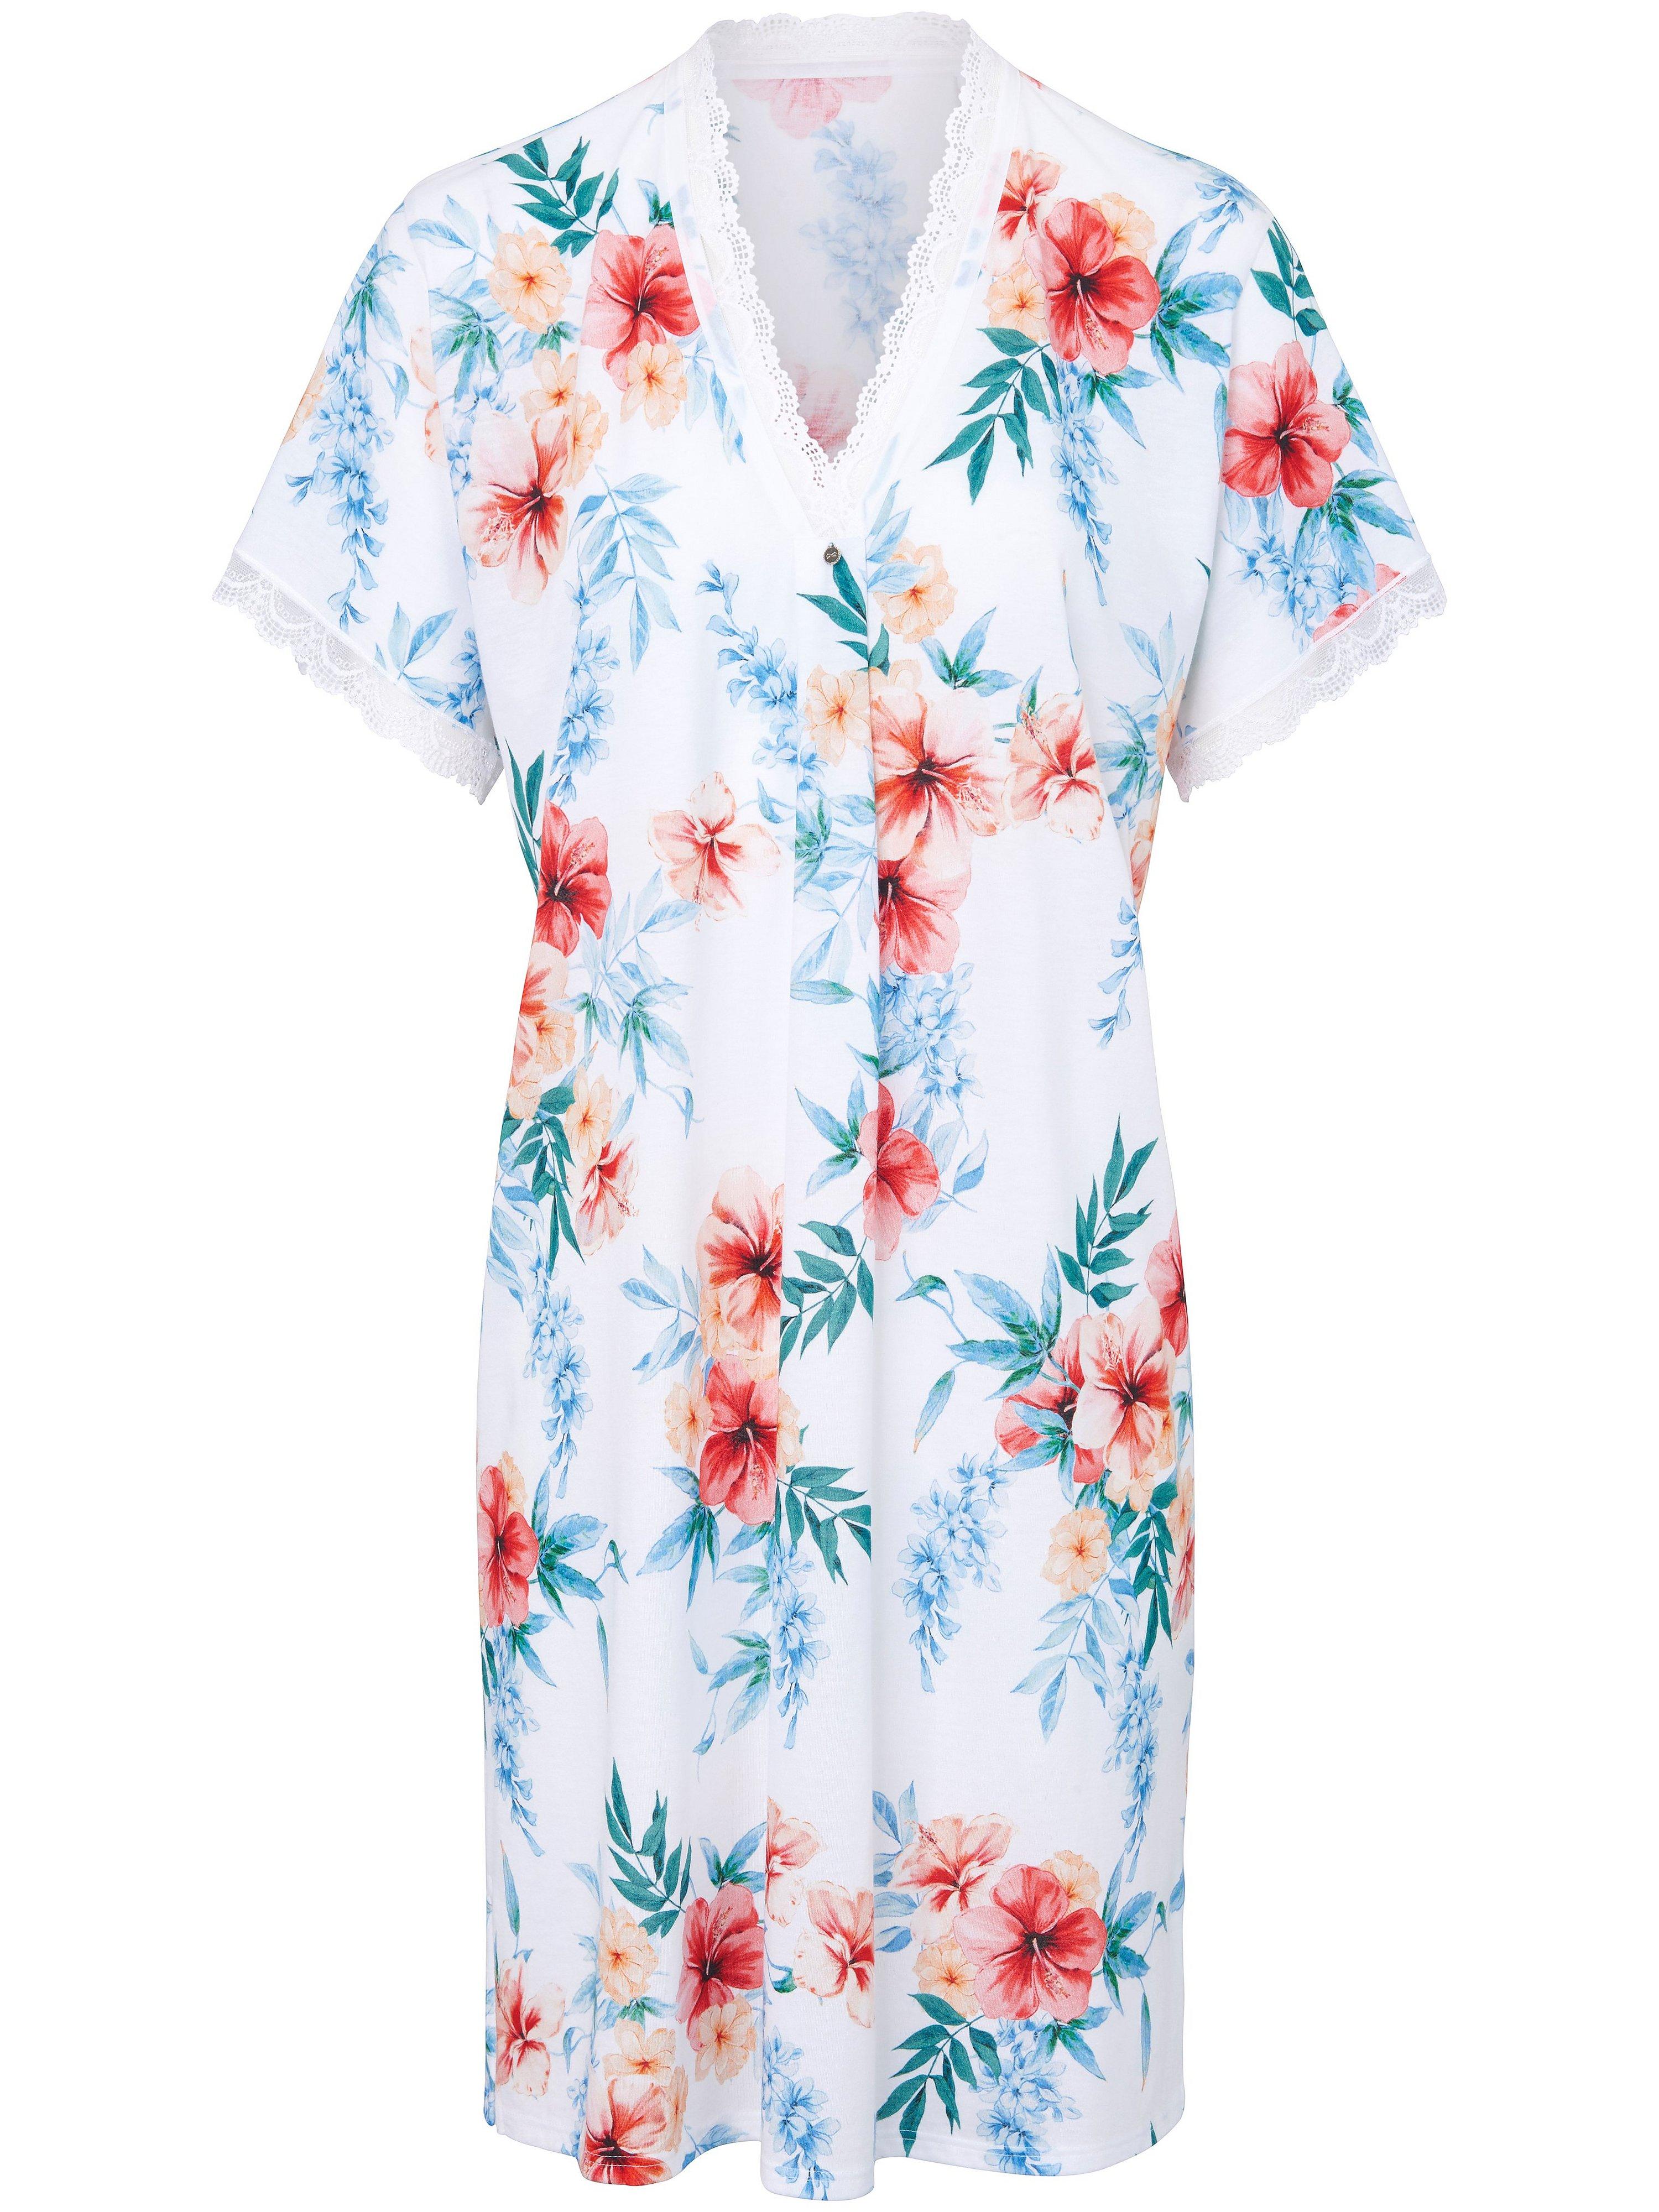 La chemise nuit single jersey  Rösch multicolore taille 46